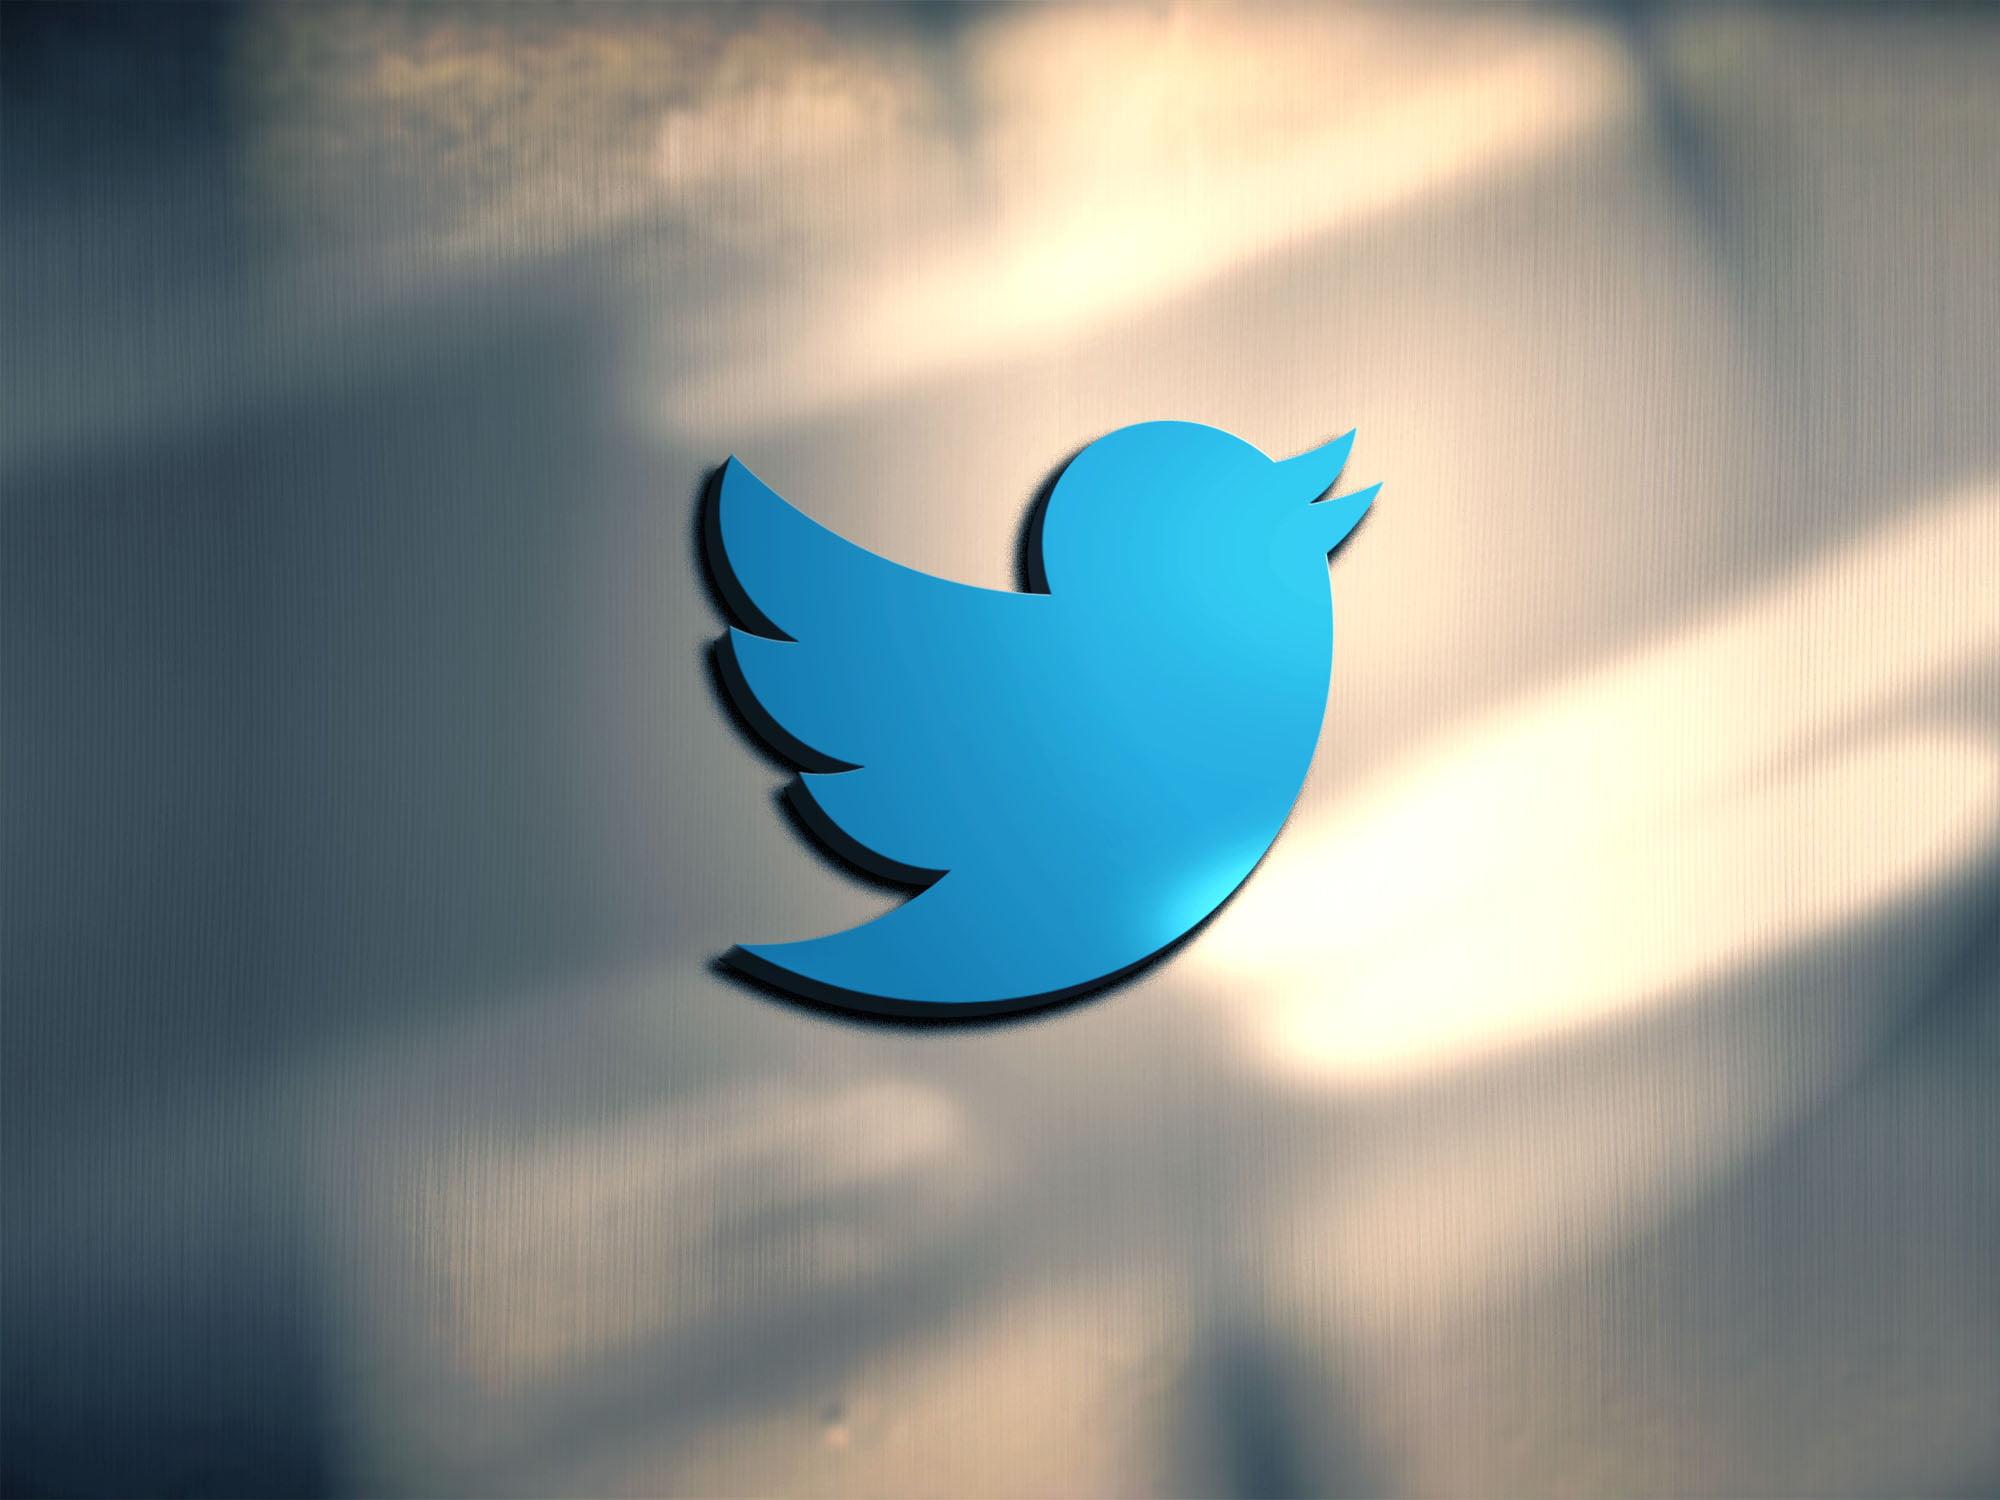 Twitter logo on 3d metal mockup